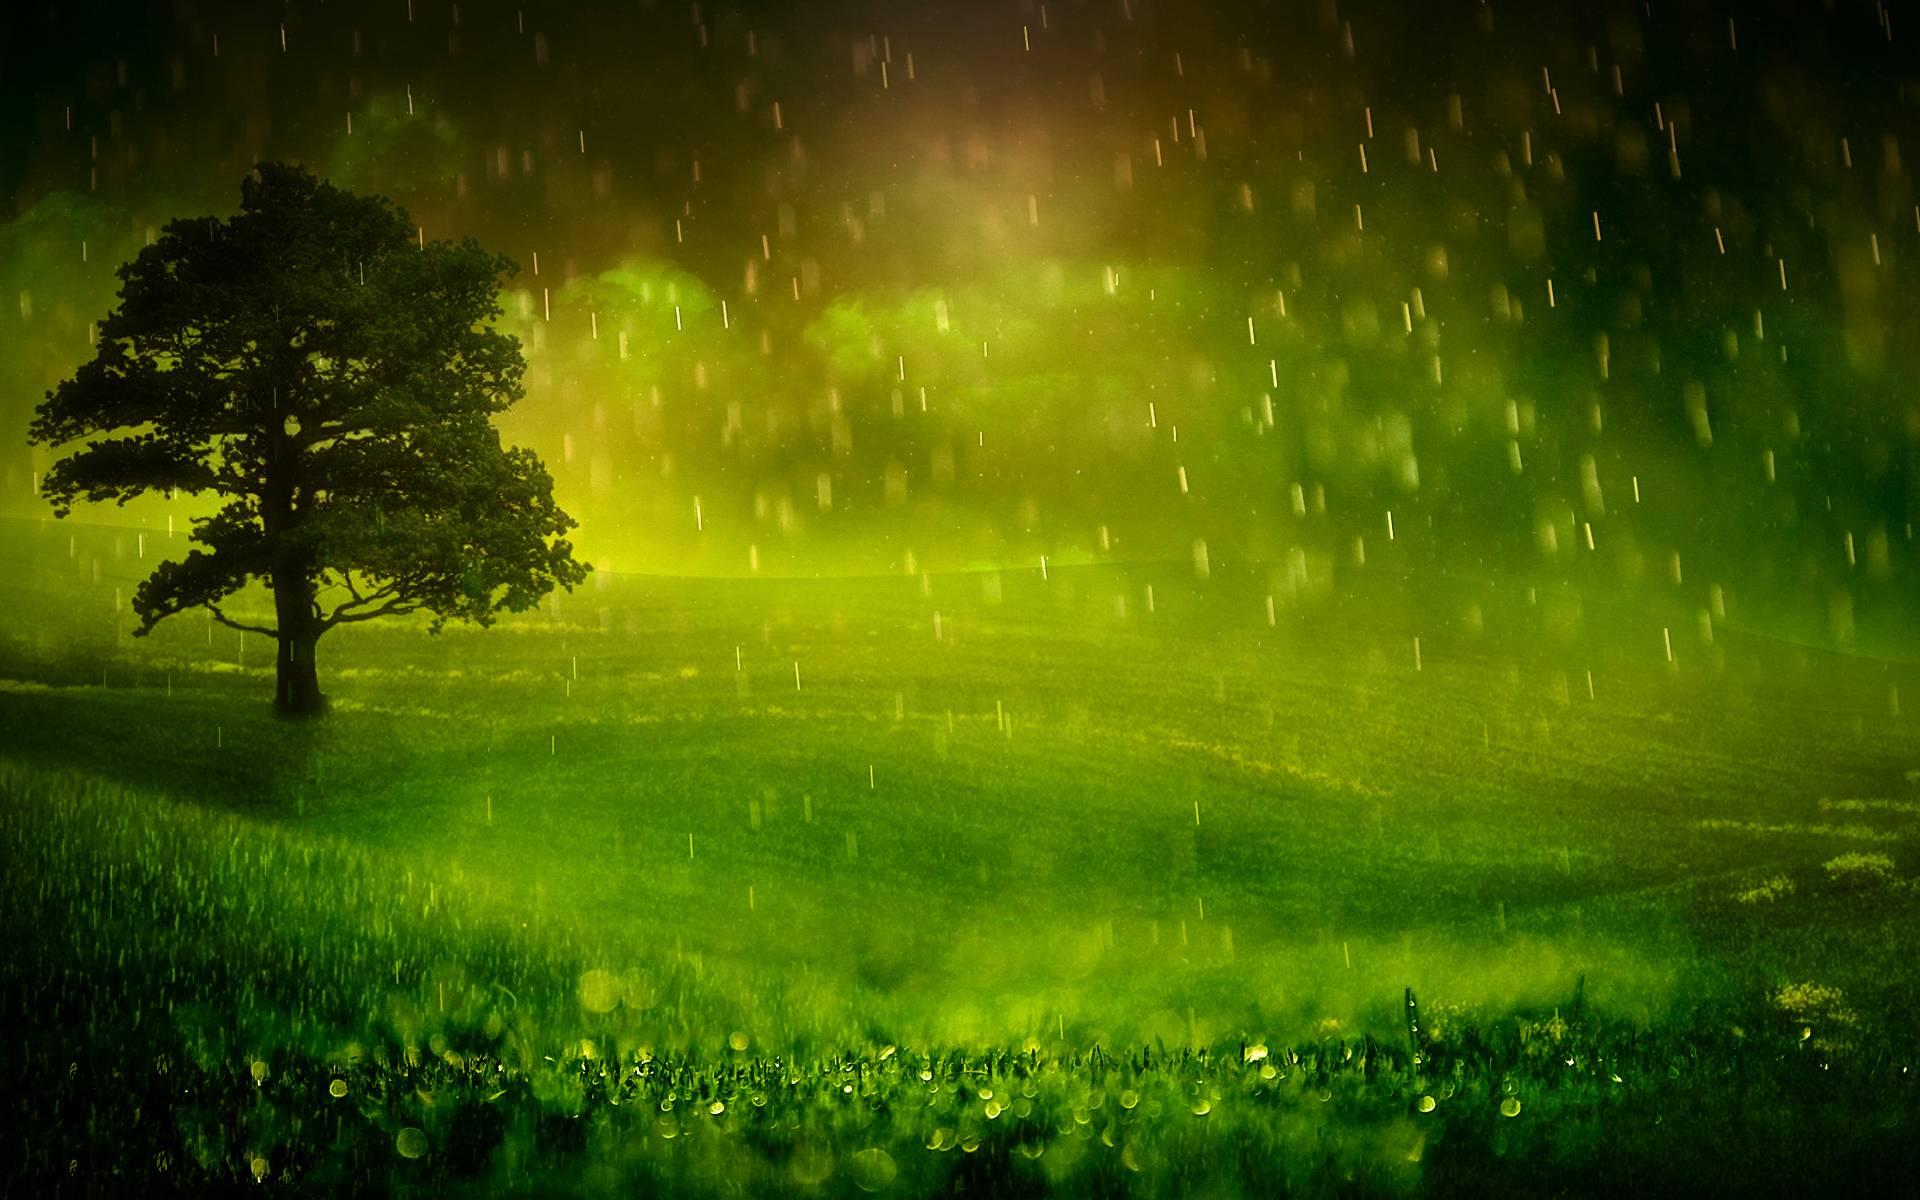 Raining Wallpapers Widescreen Mekamak